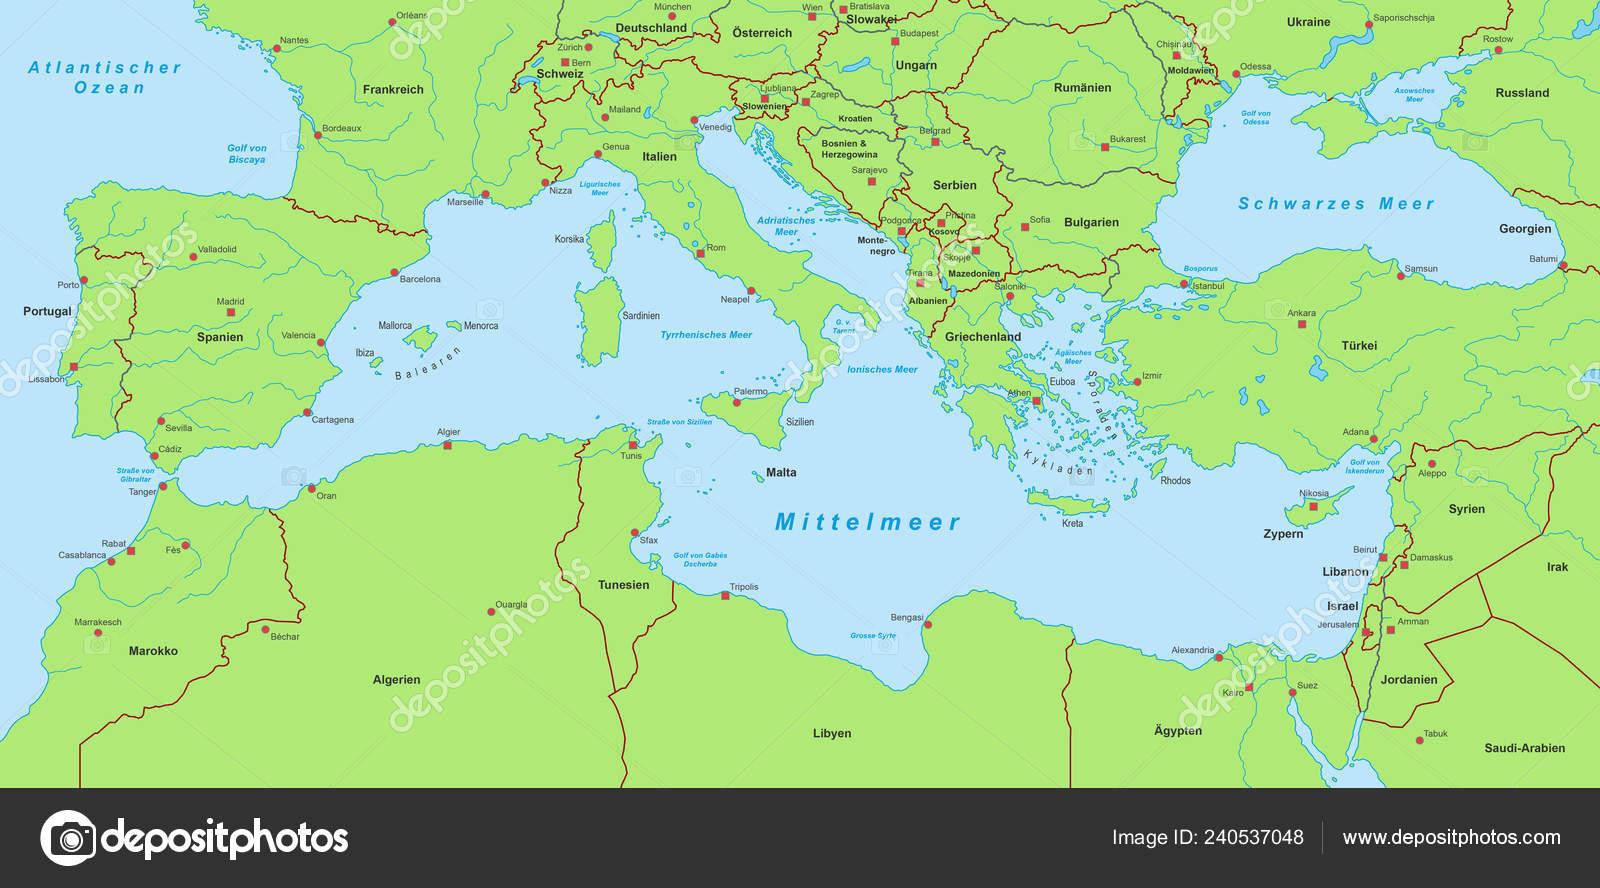 Mapa Del Mar Mediterraneo.Mapa Mar Mediterraneo Vector De Stock C Ii Graphics 240537048